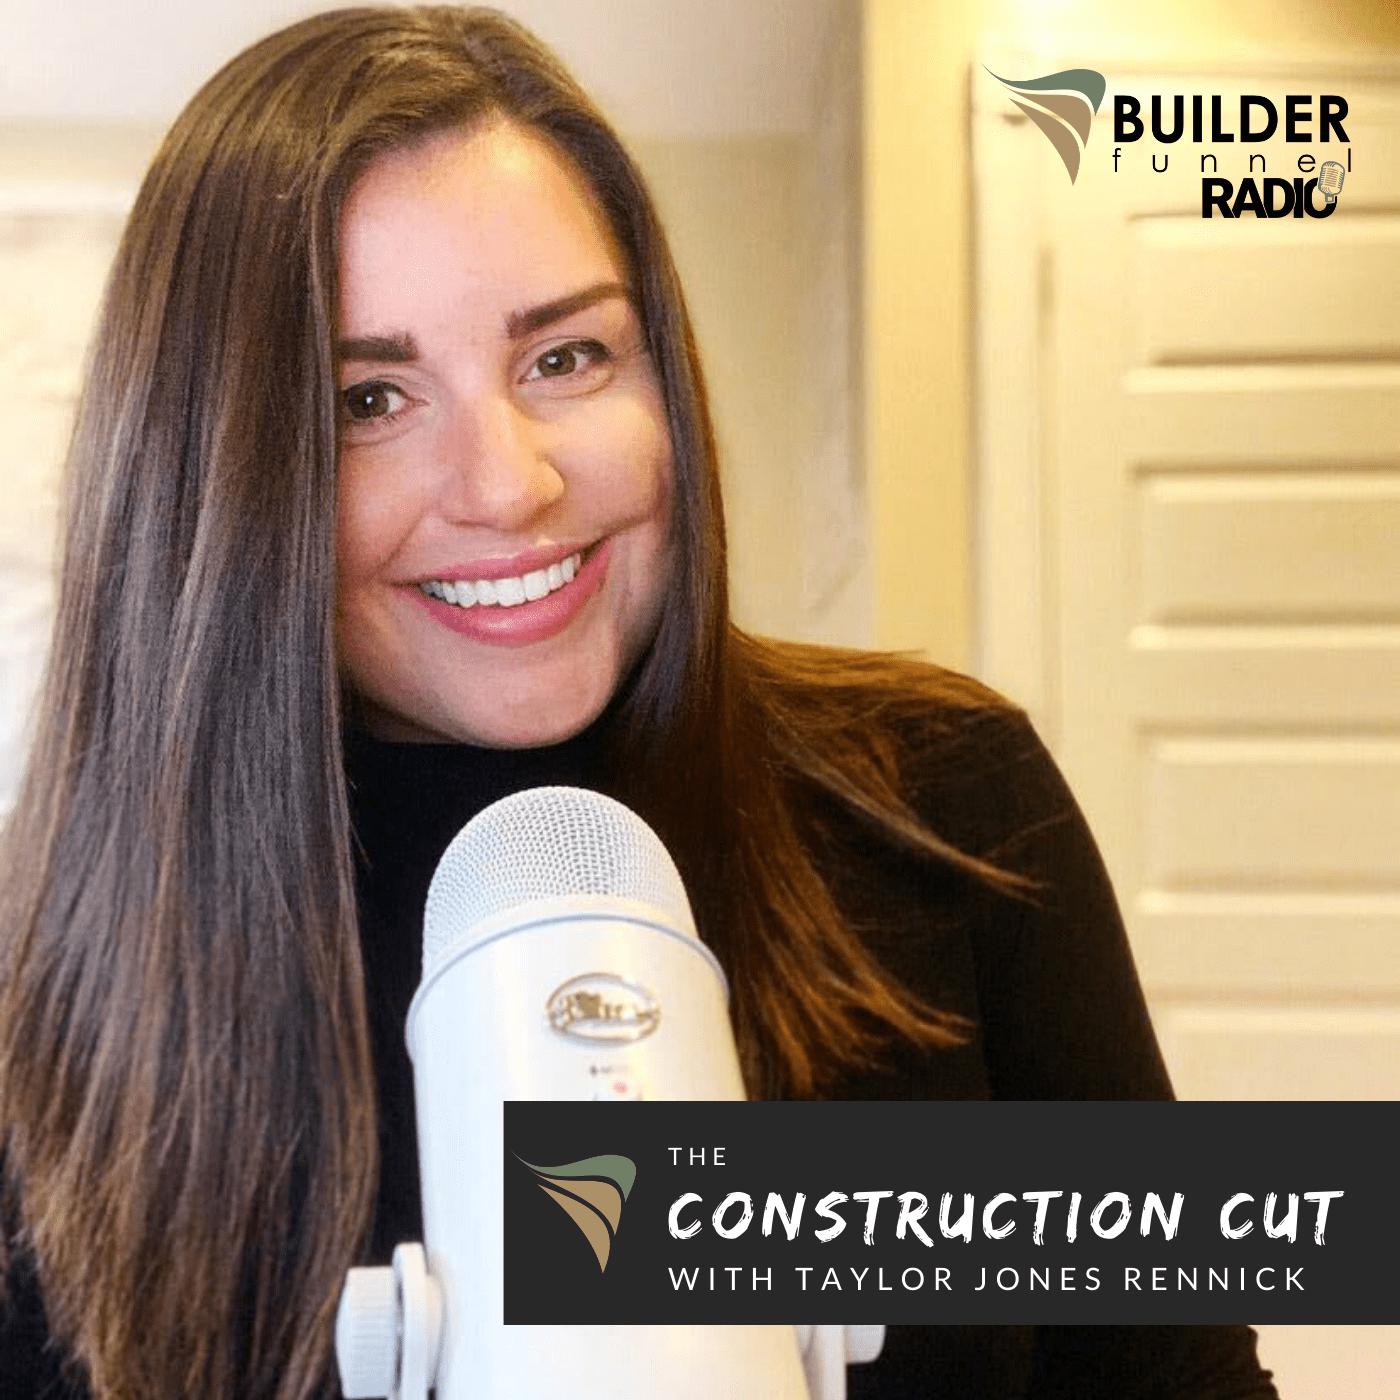 The Construction Cut